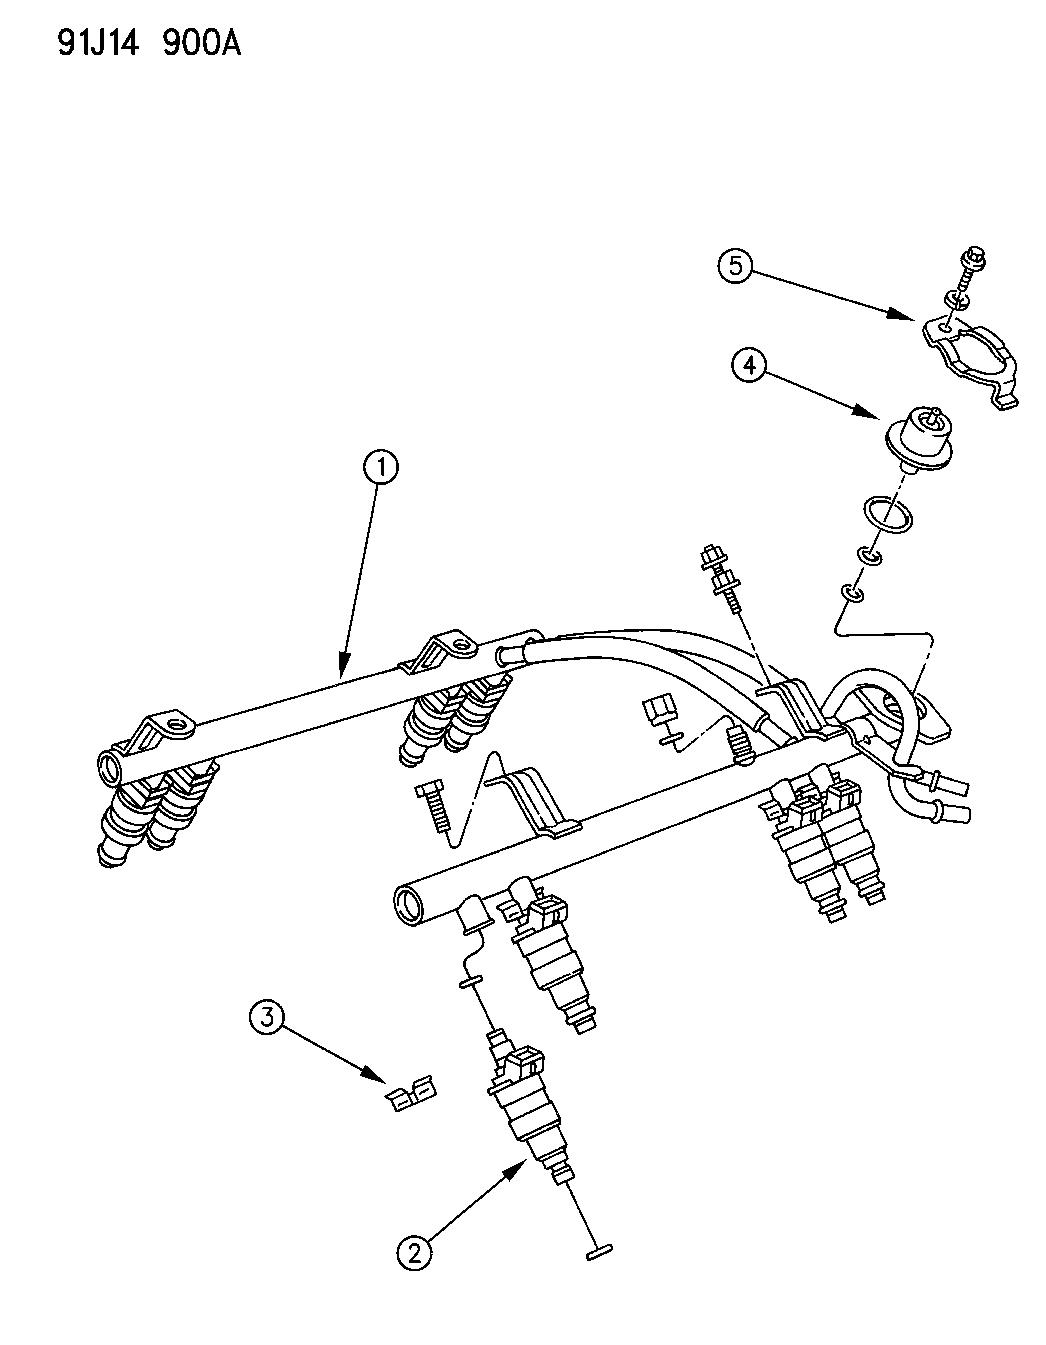 1994 Jeep Cherokee Jeep Wrangle Service Repair Manual Download